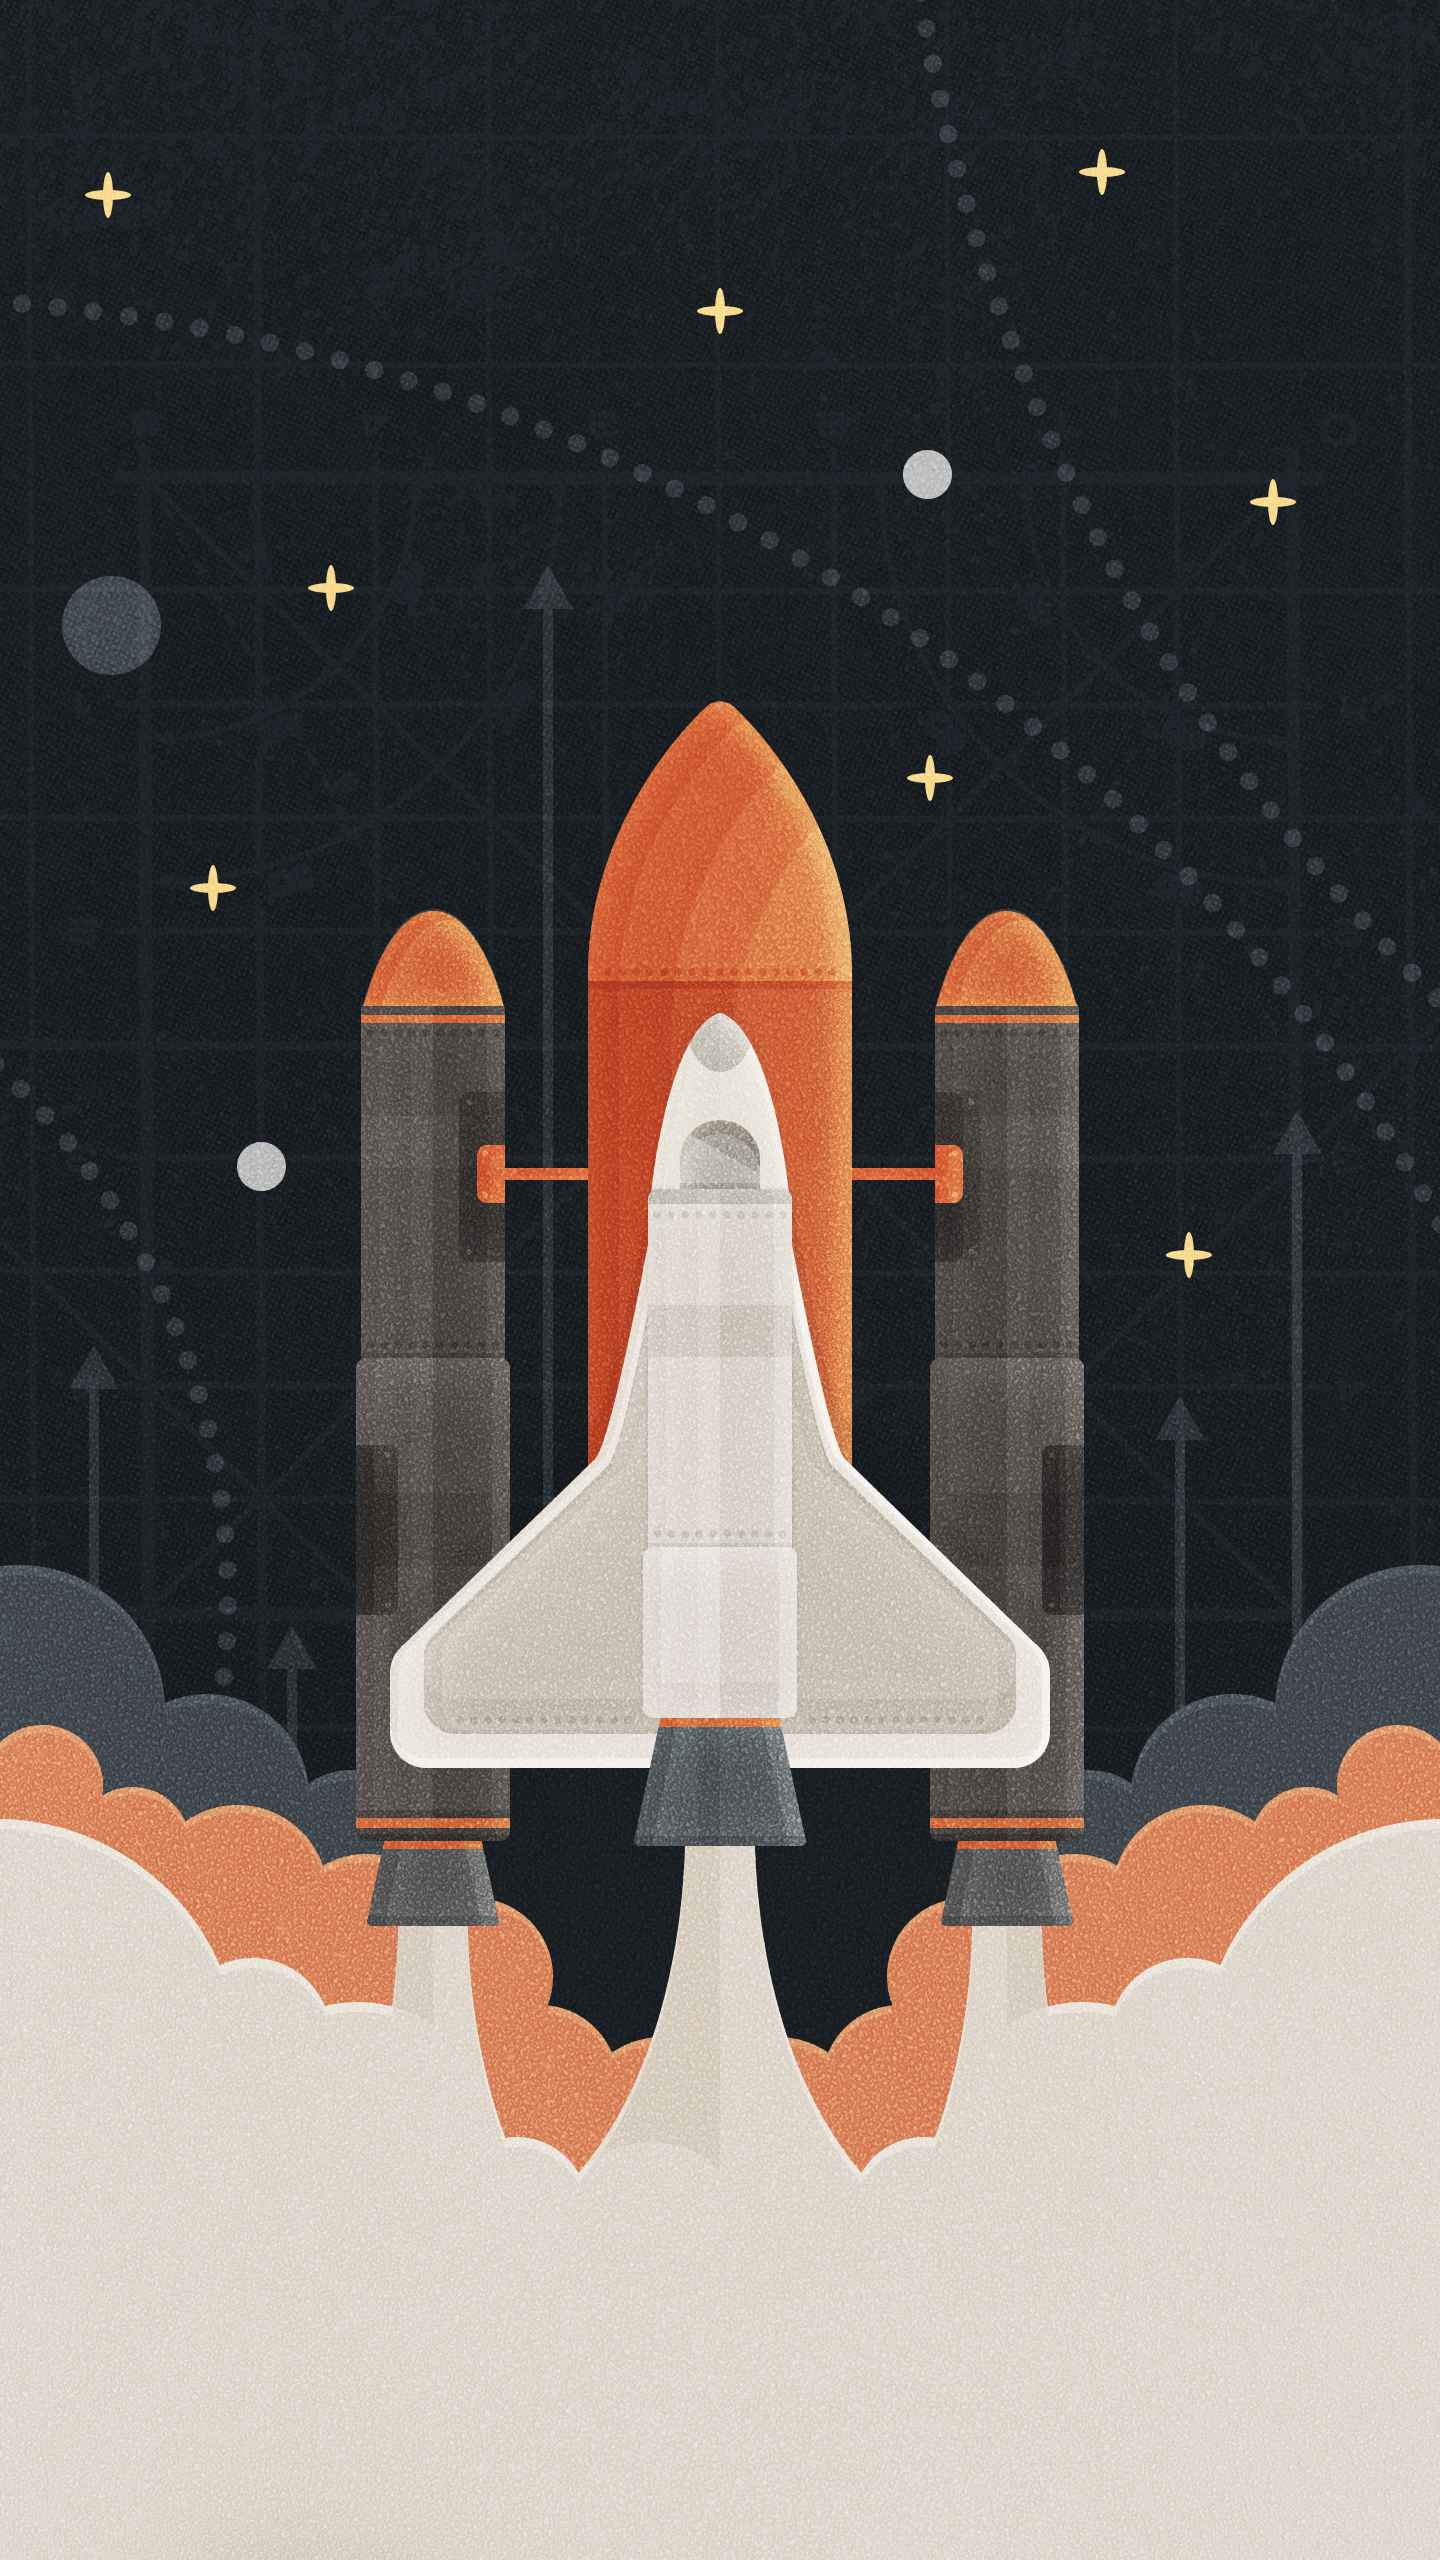 Space Shuttle Launch iPhone Wallpaper